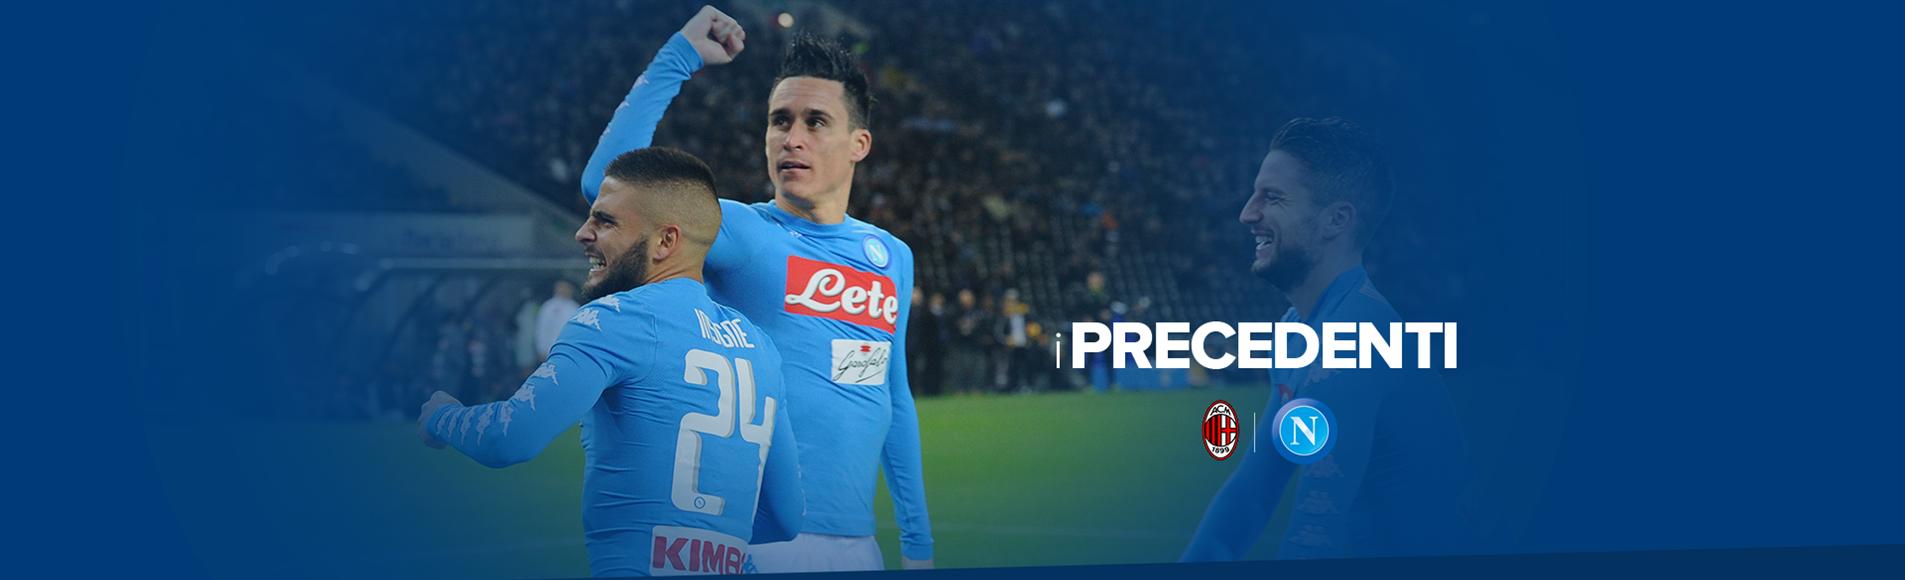 Milan Napoli i precedenti